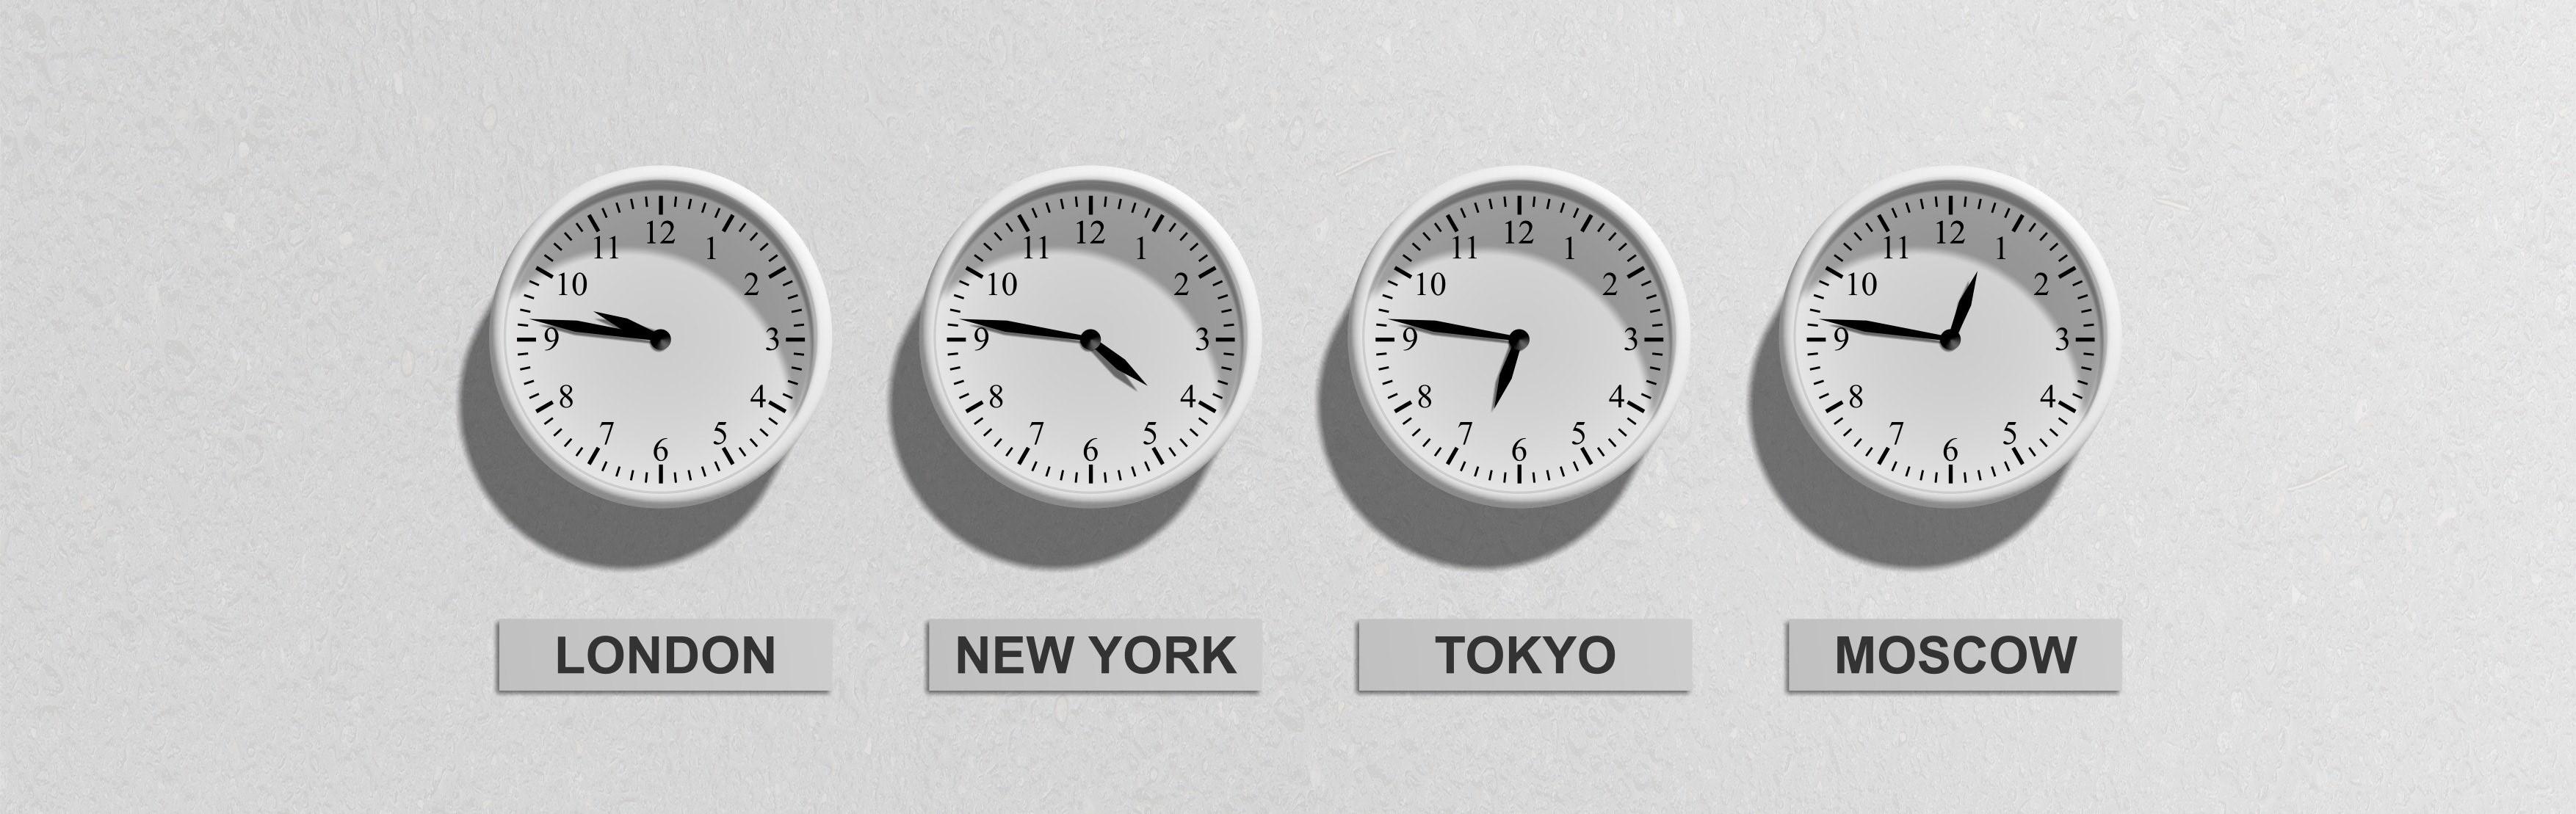 london-new-york-tokyo-and-moscow-clocks-48770.jpg